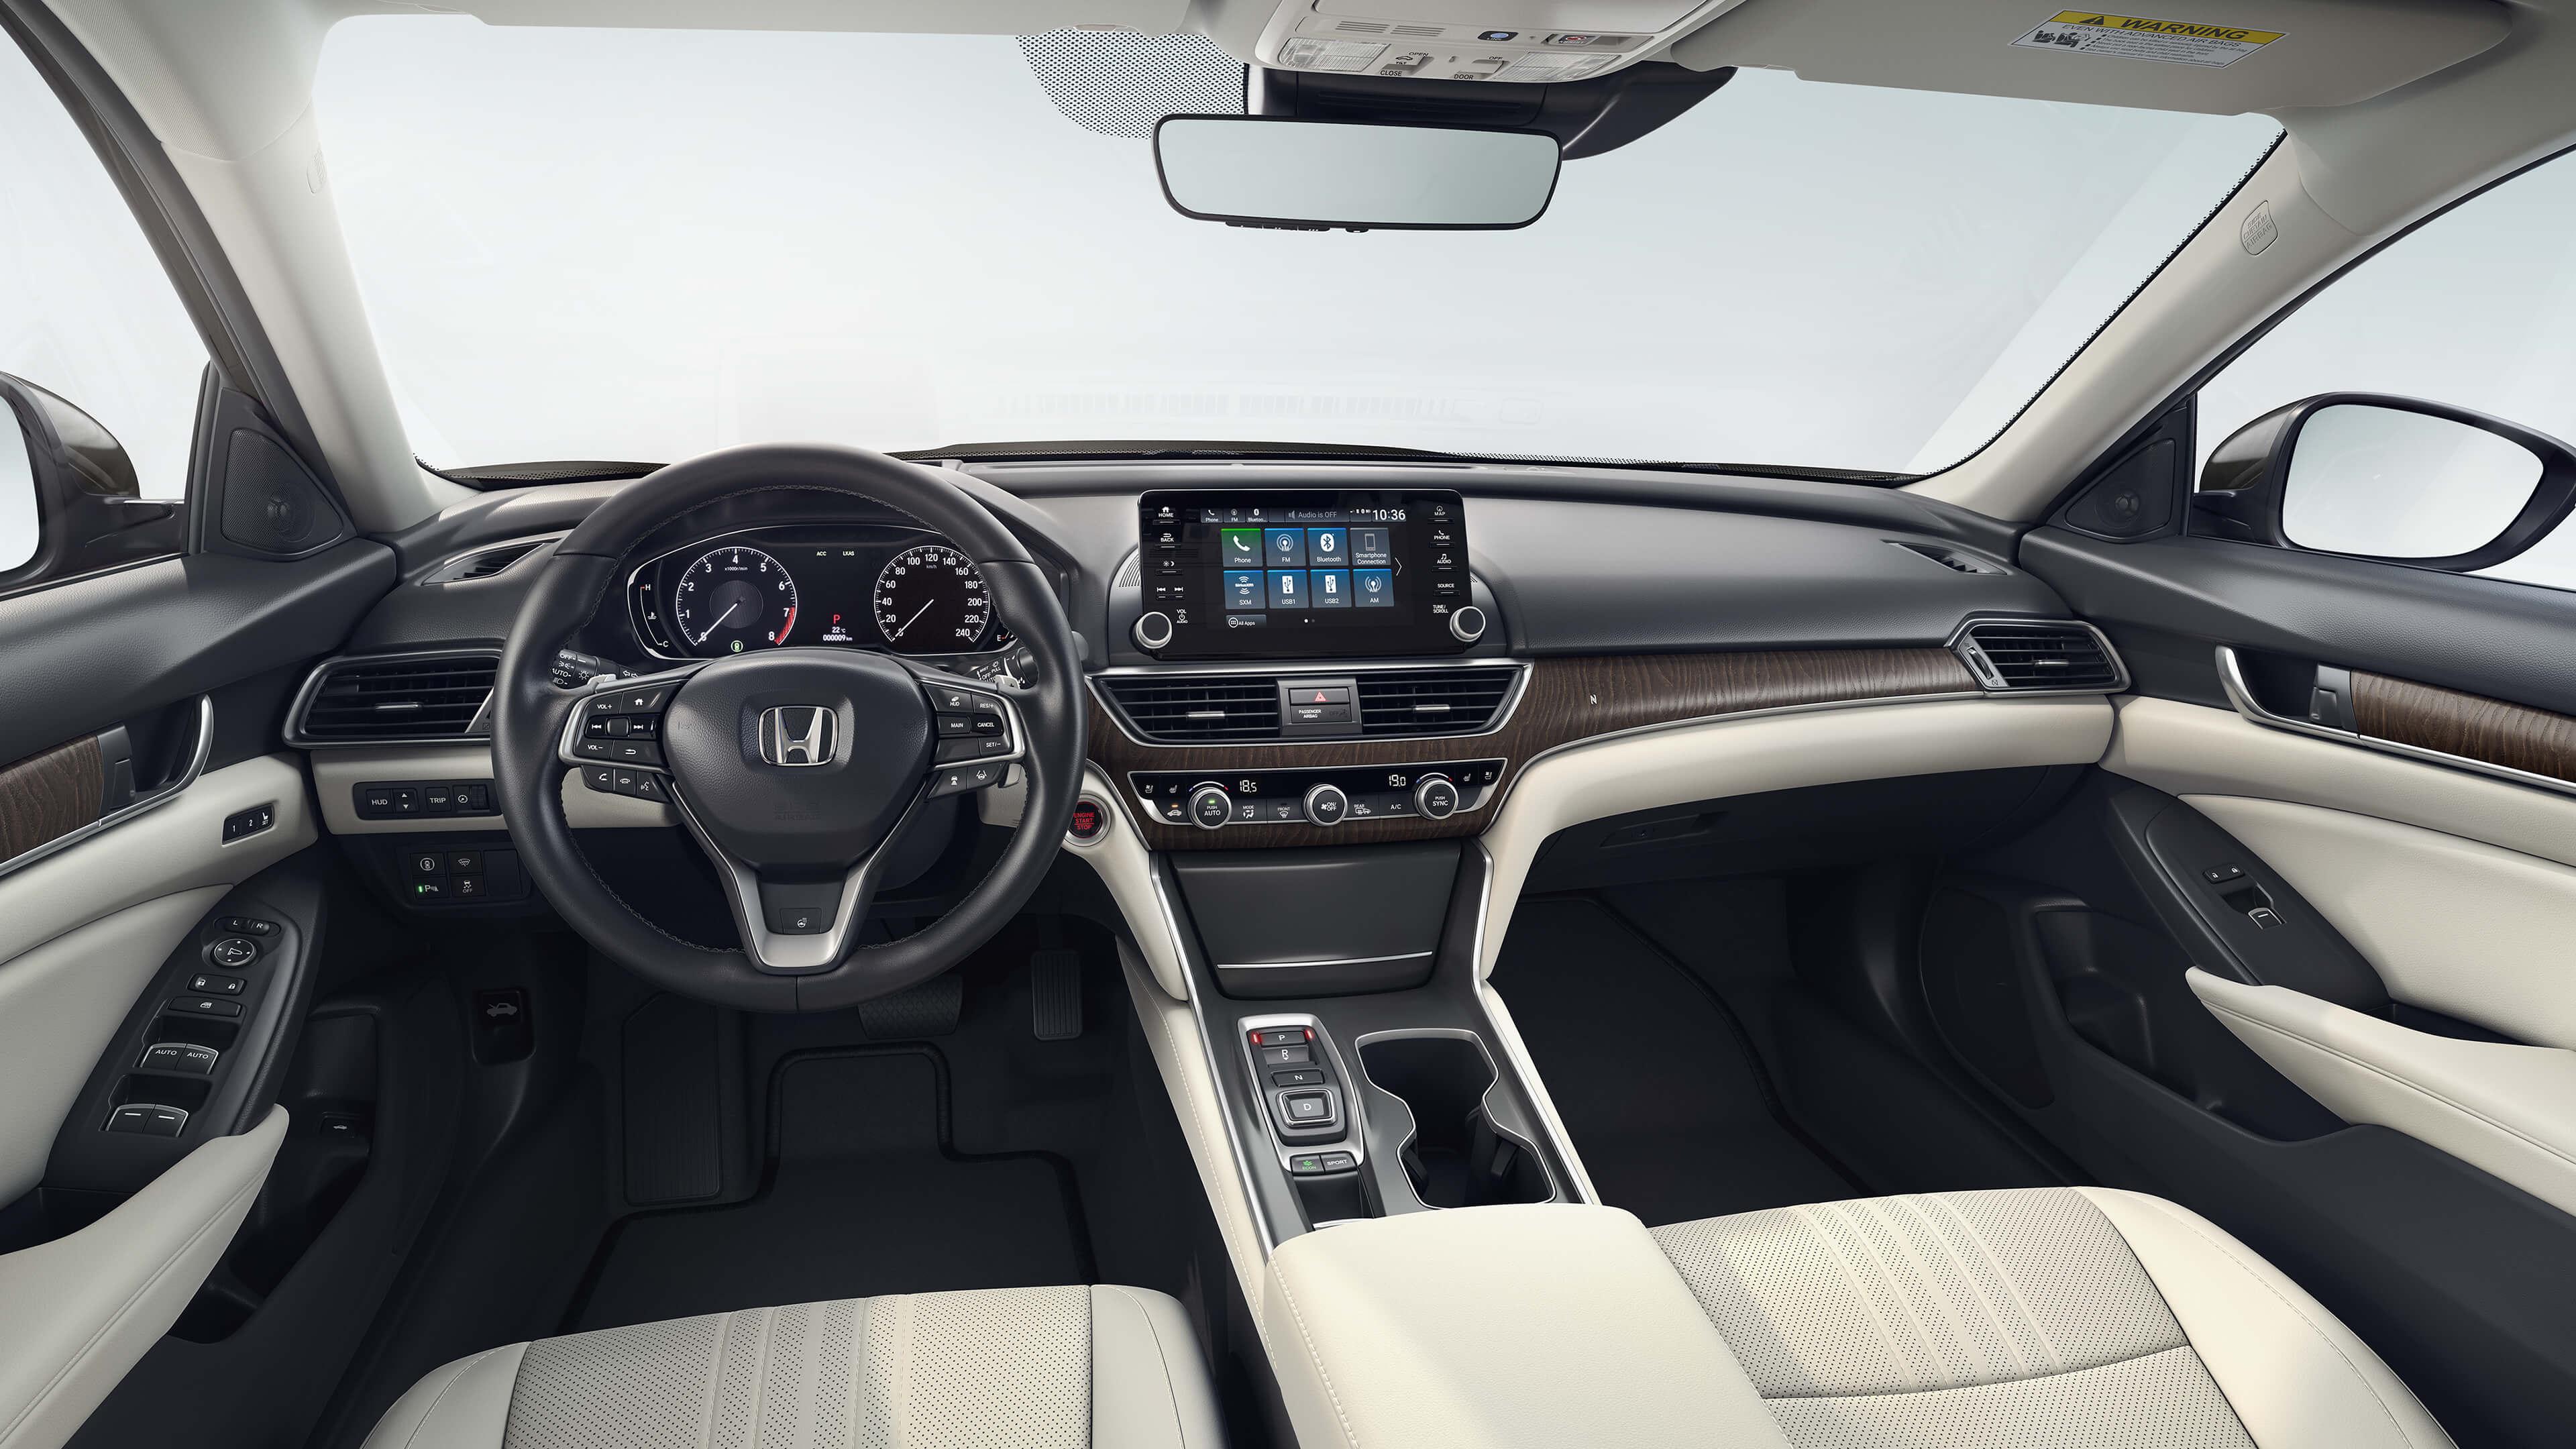 2019 Honda Accord interior 2